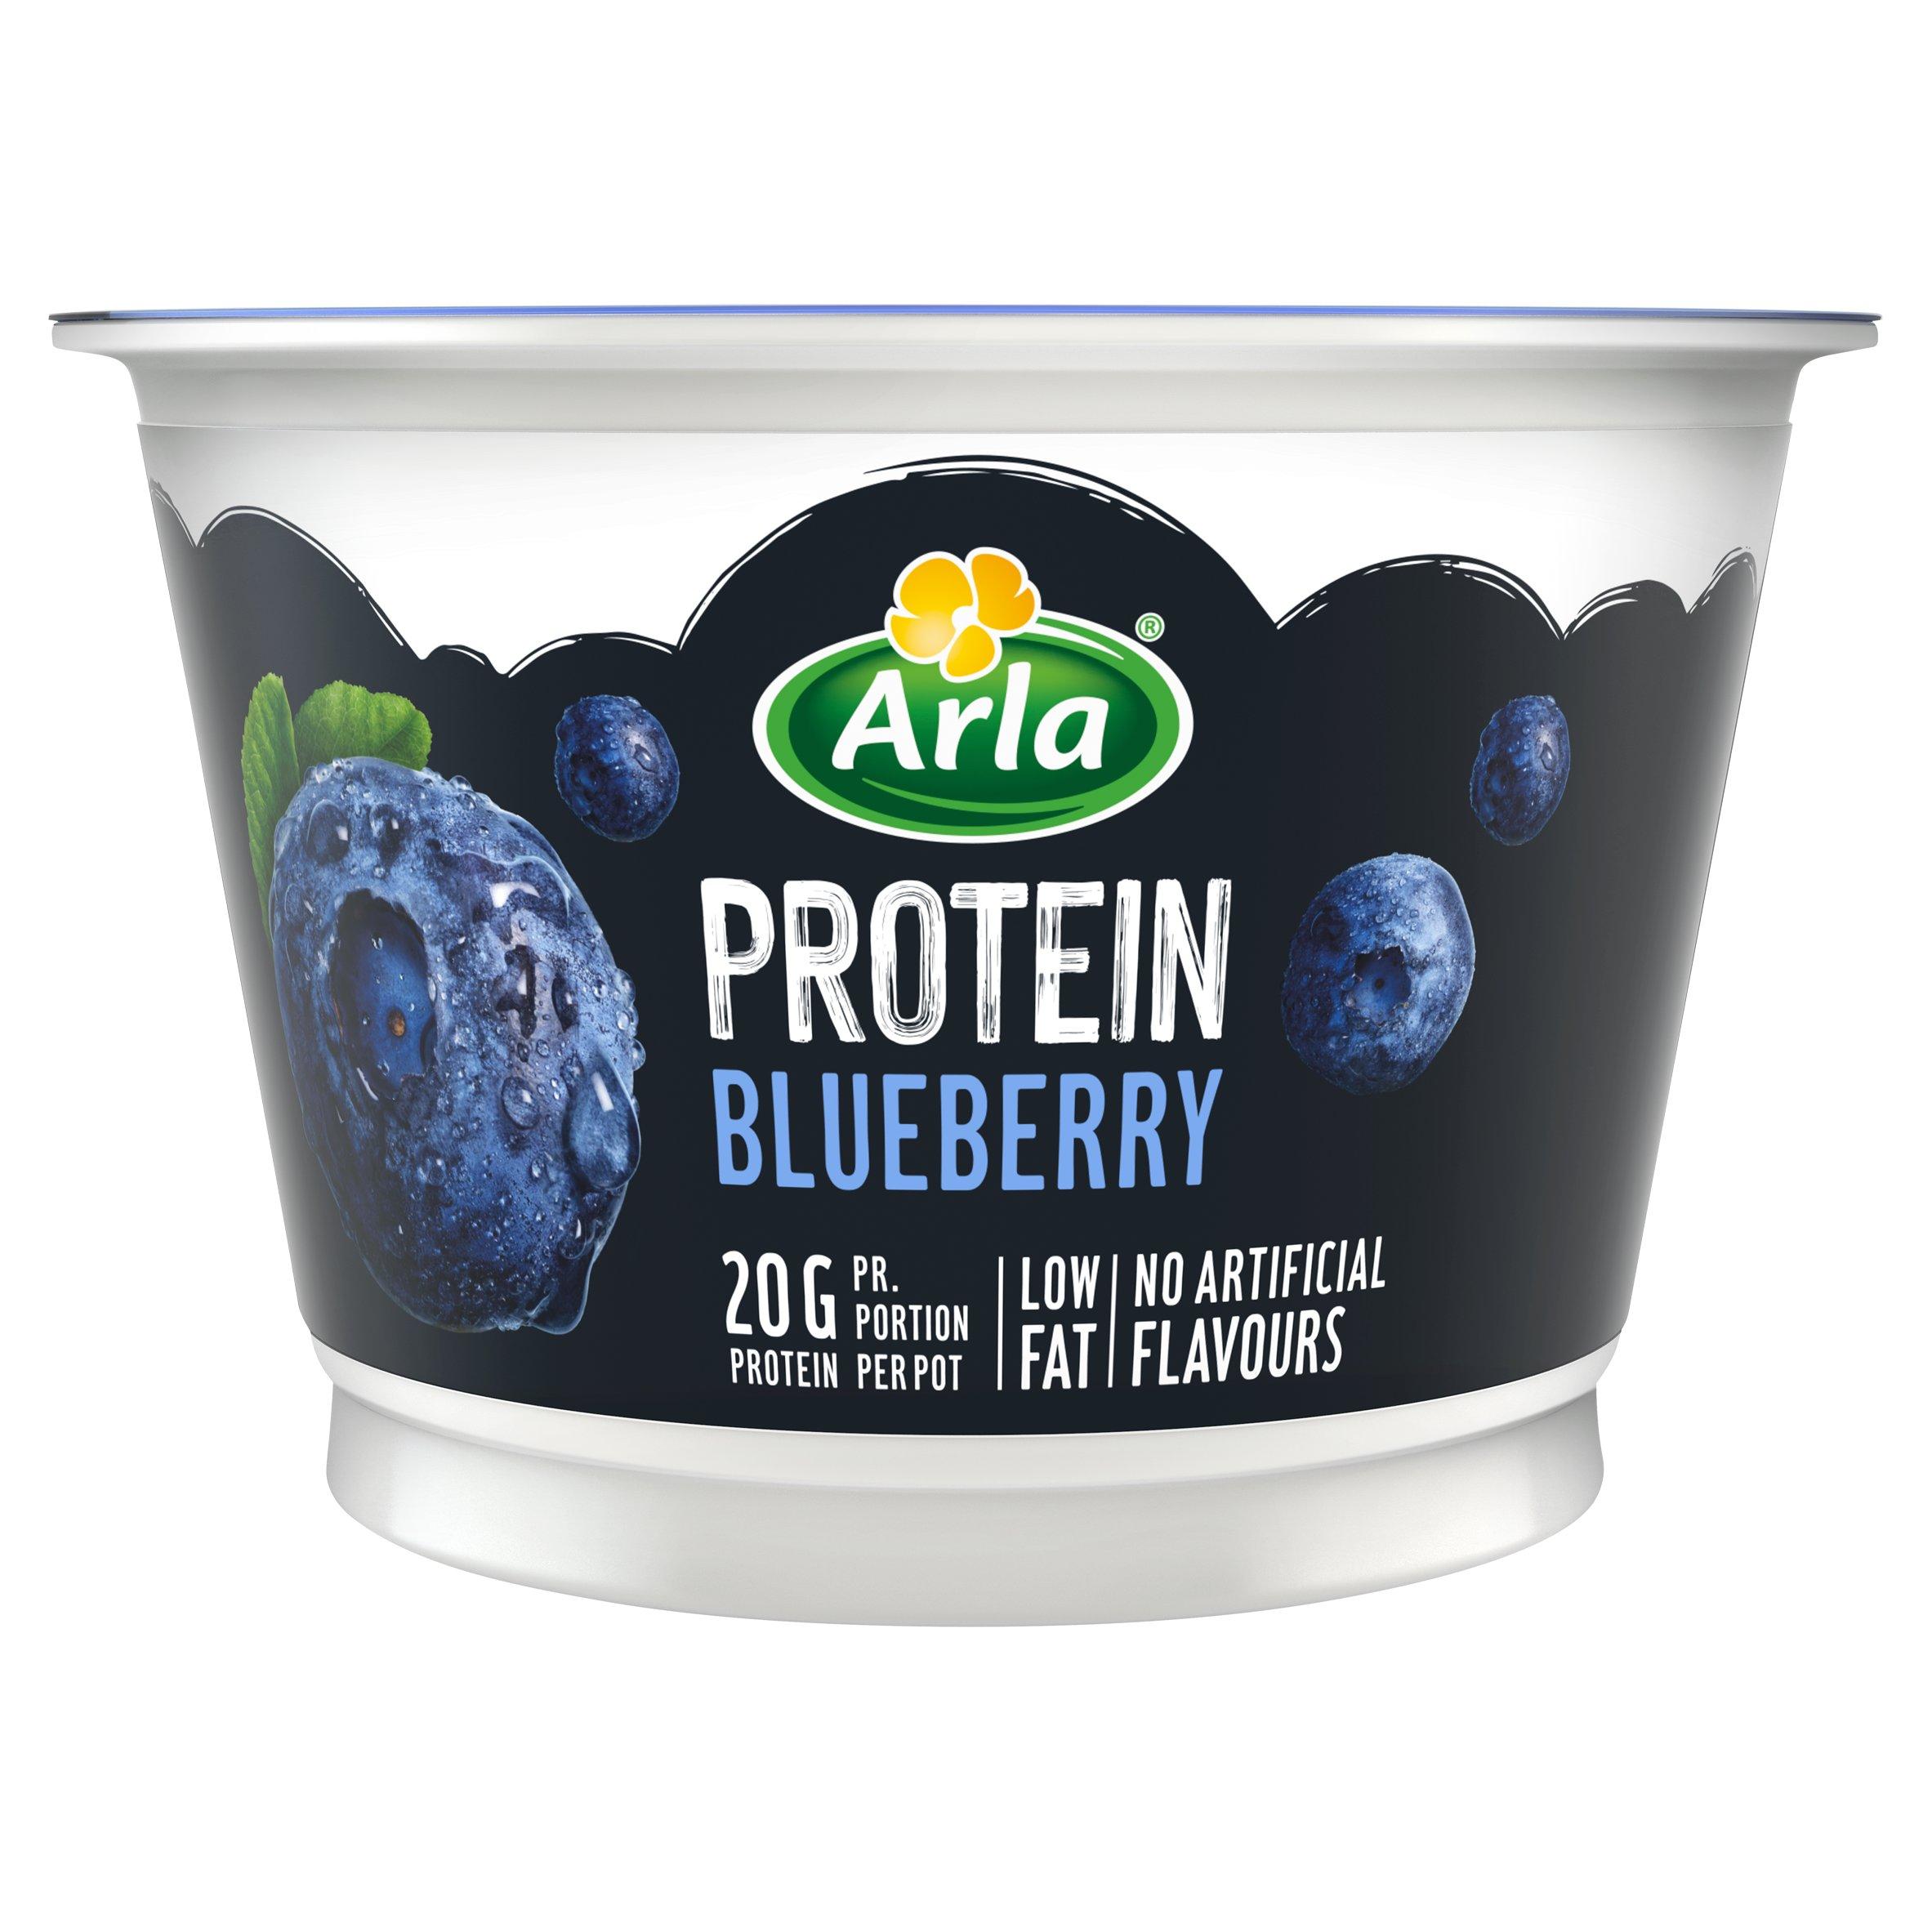 Arla Protein Blueberry 200G